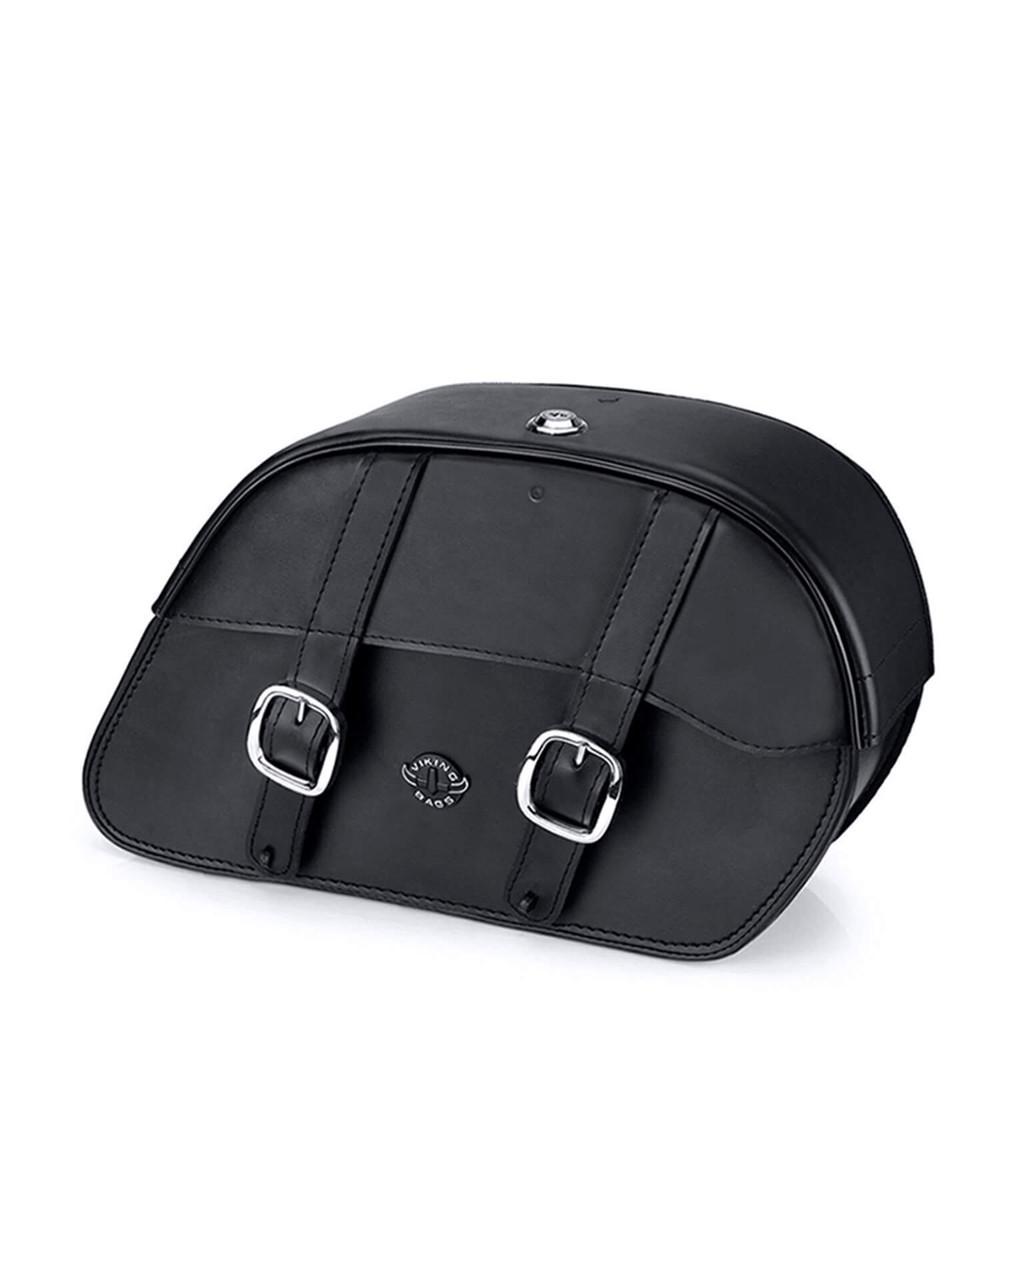 Suzuki Intruder 1500 VL1500 Charger Slanted Medium Motorcycle Saddlebags Main Bag View